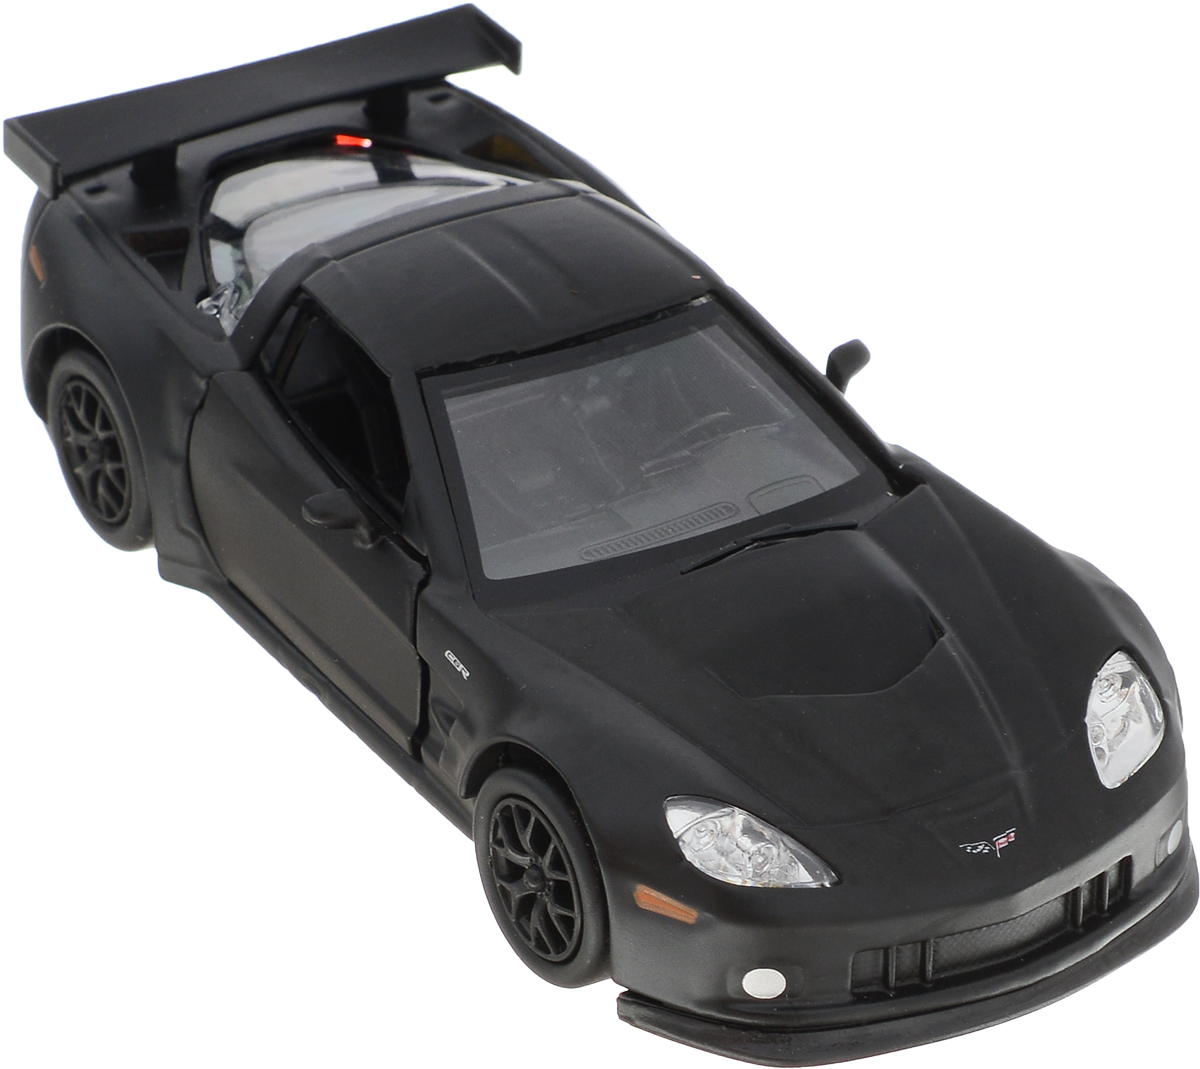 Autotime Модель автомобиля Chevrolet Corvette C6-R цвет черный машинки autotime машина uaz 31514 ваи